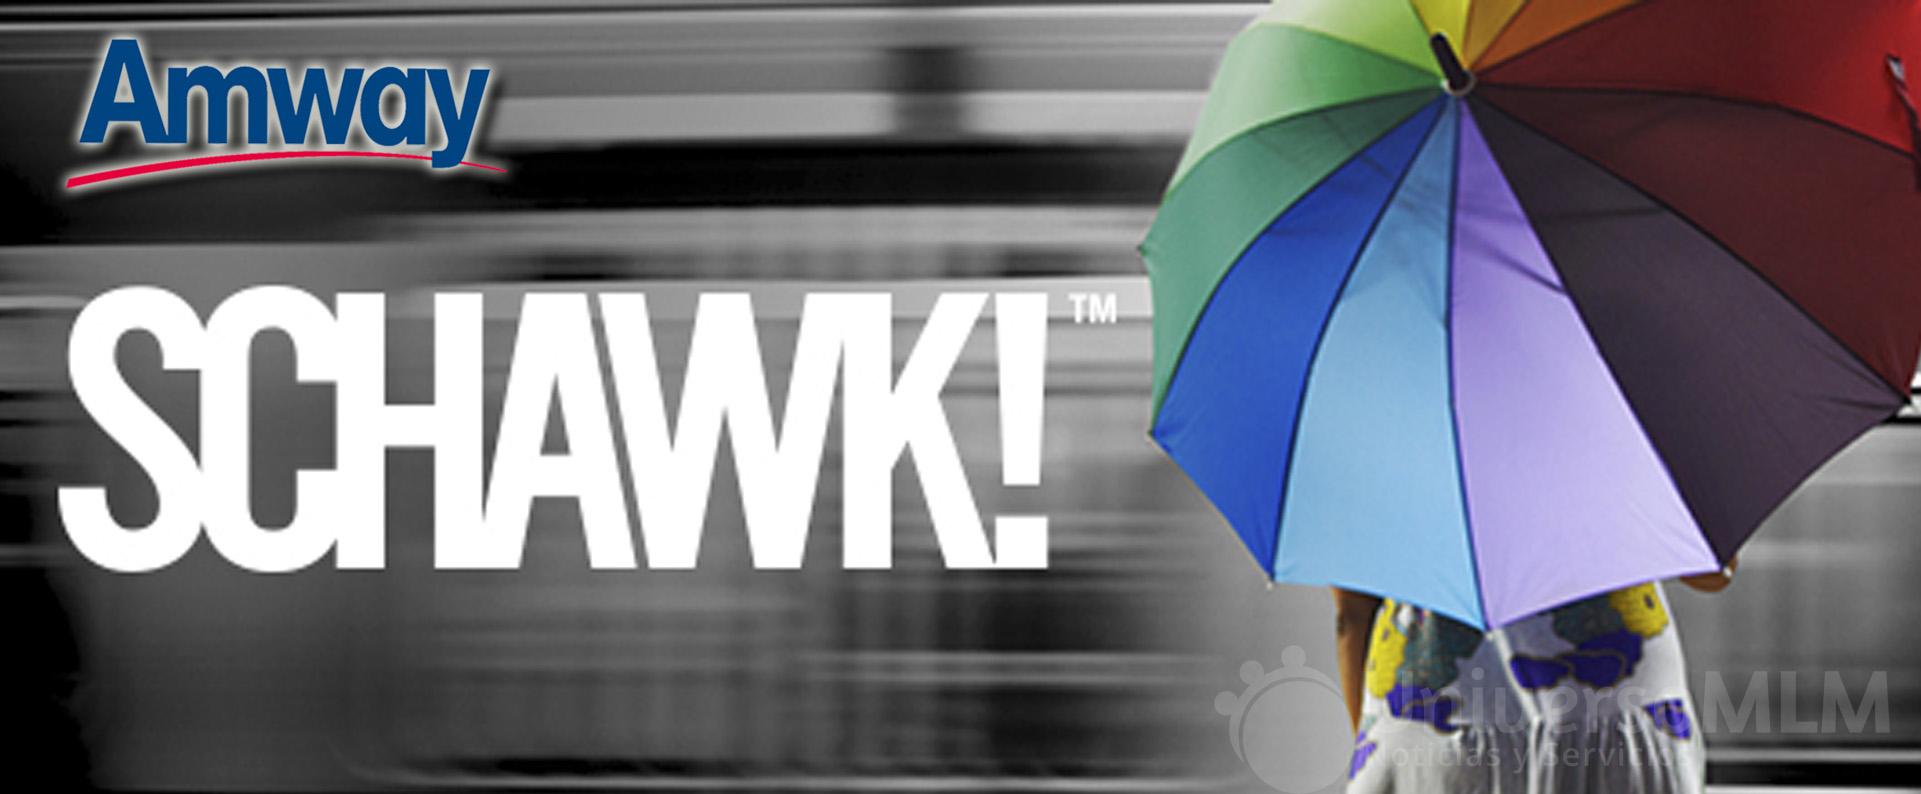 Amway entrega un premio a Shawk